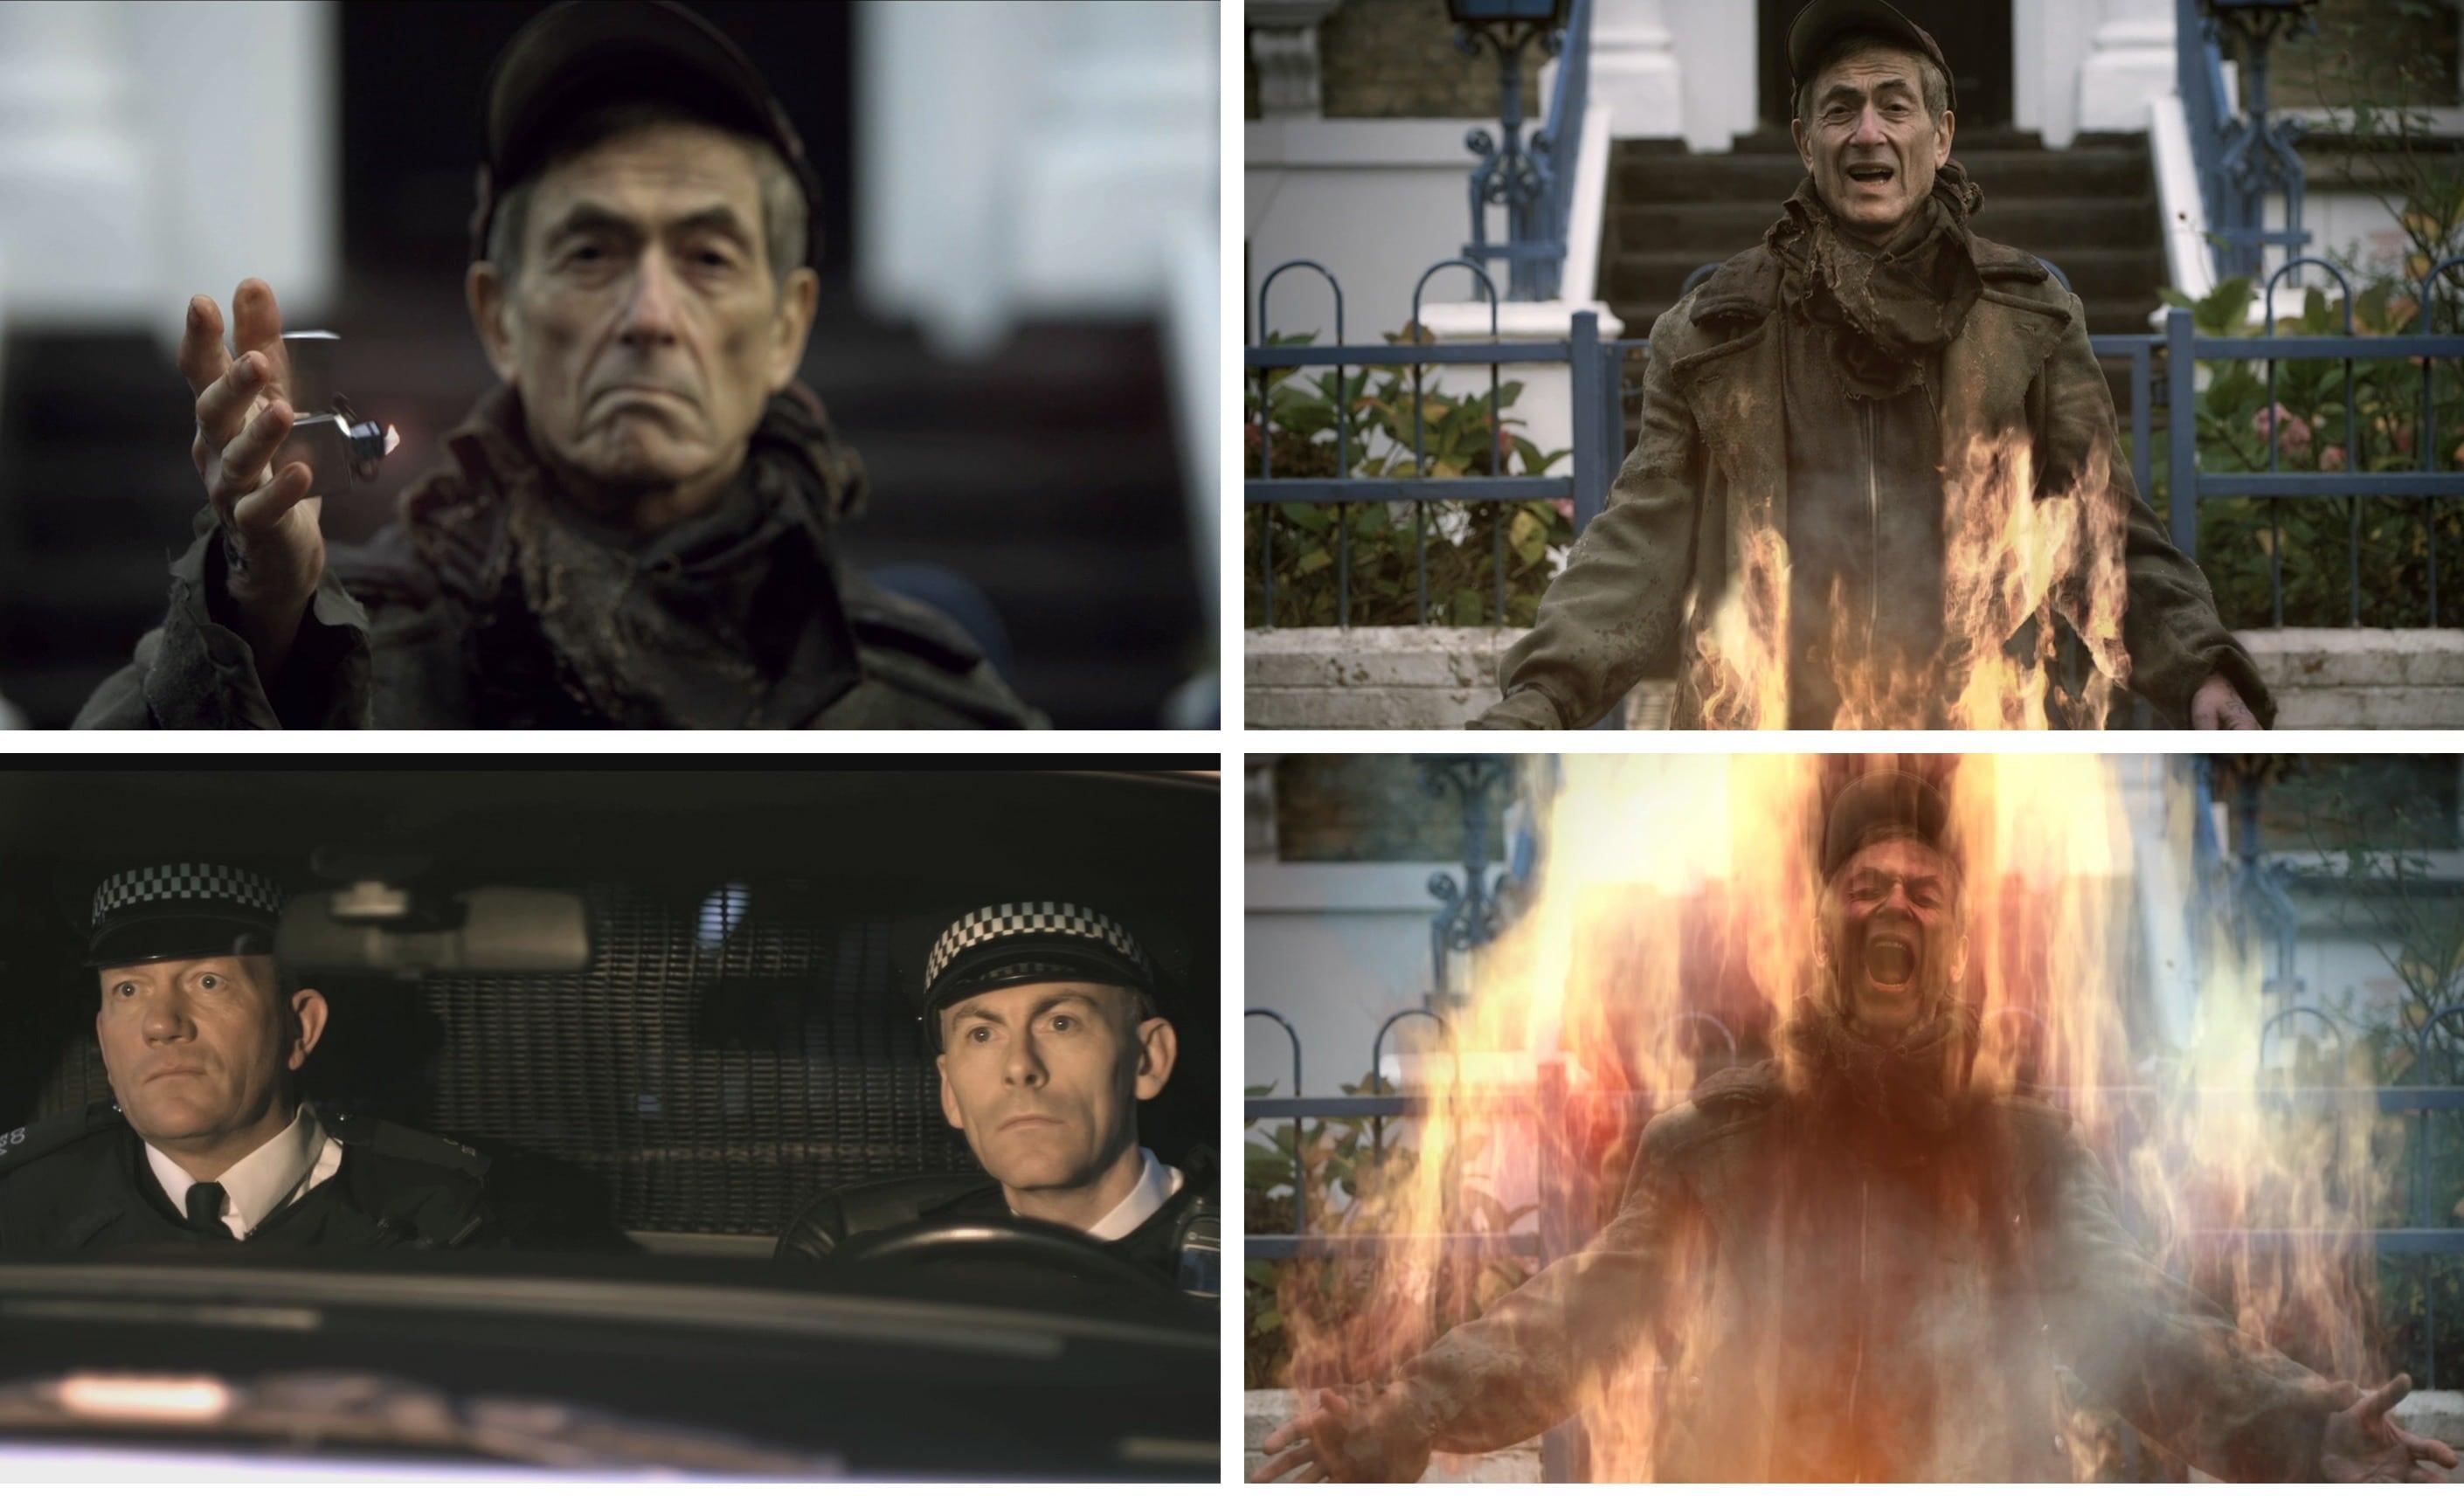 stas3dart-itch-london-burning-music-video-fire